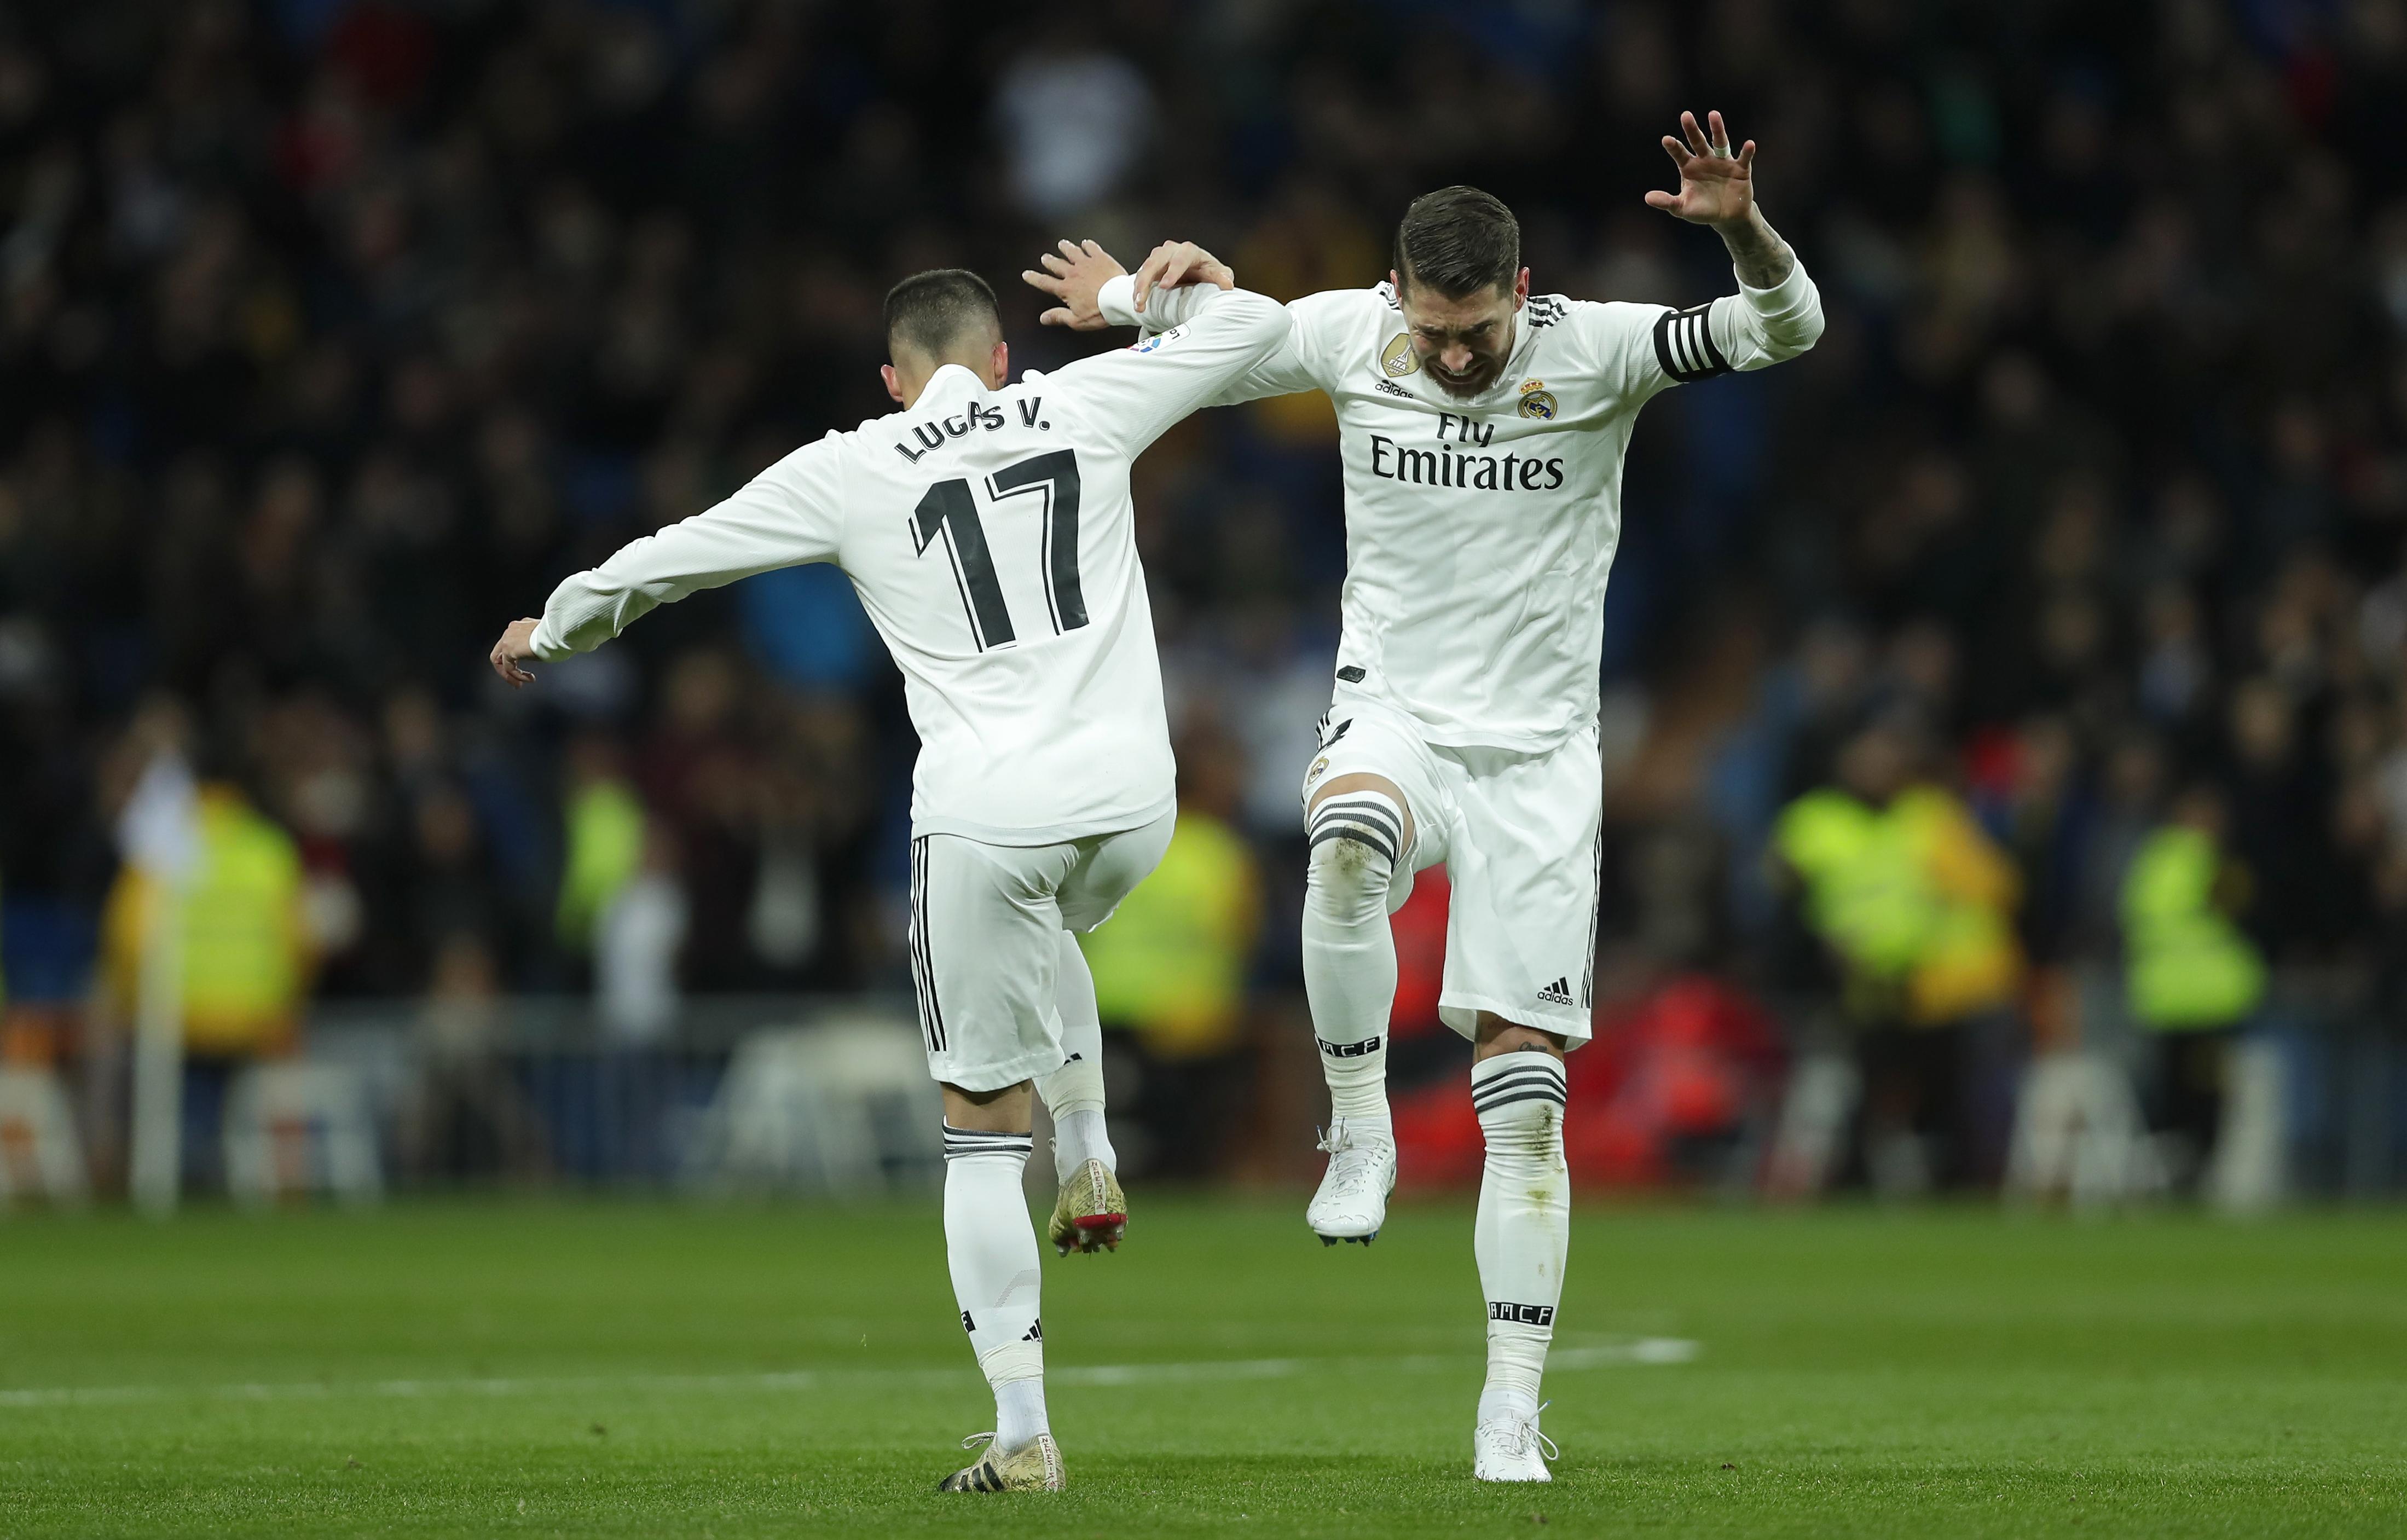 Madrid beats Girona in 1st leg of Copa del Rey quarterfinals